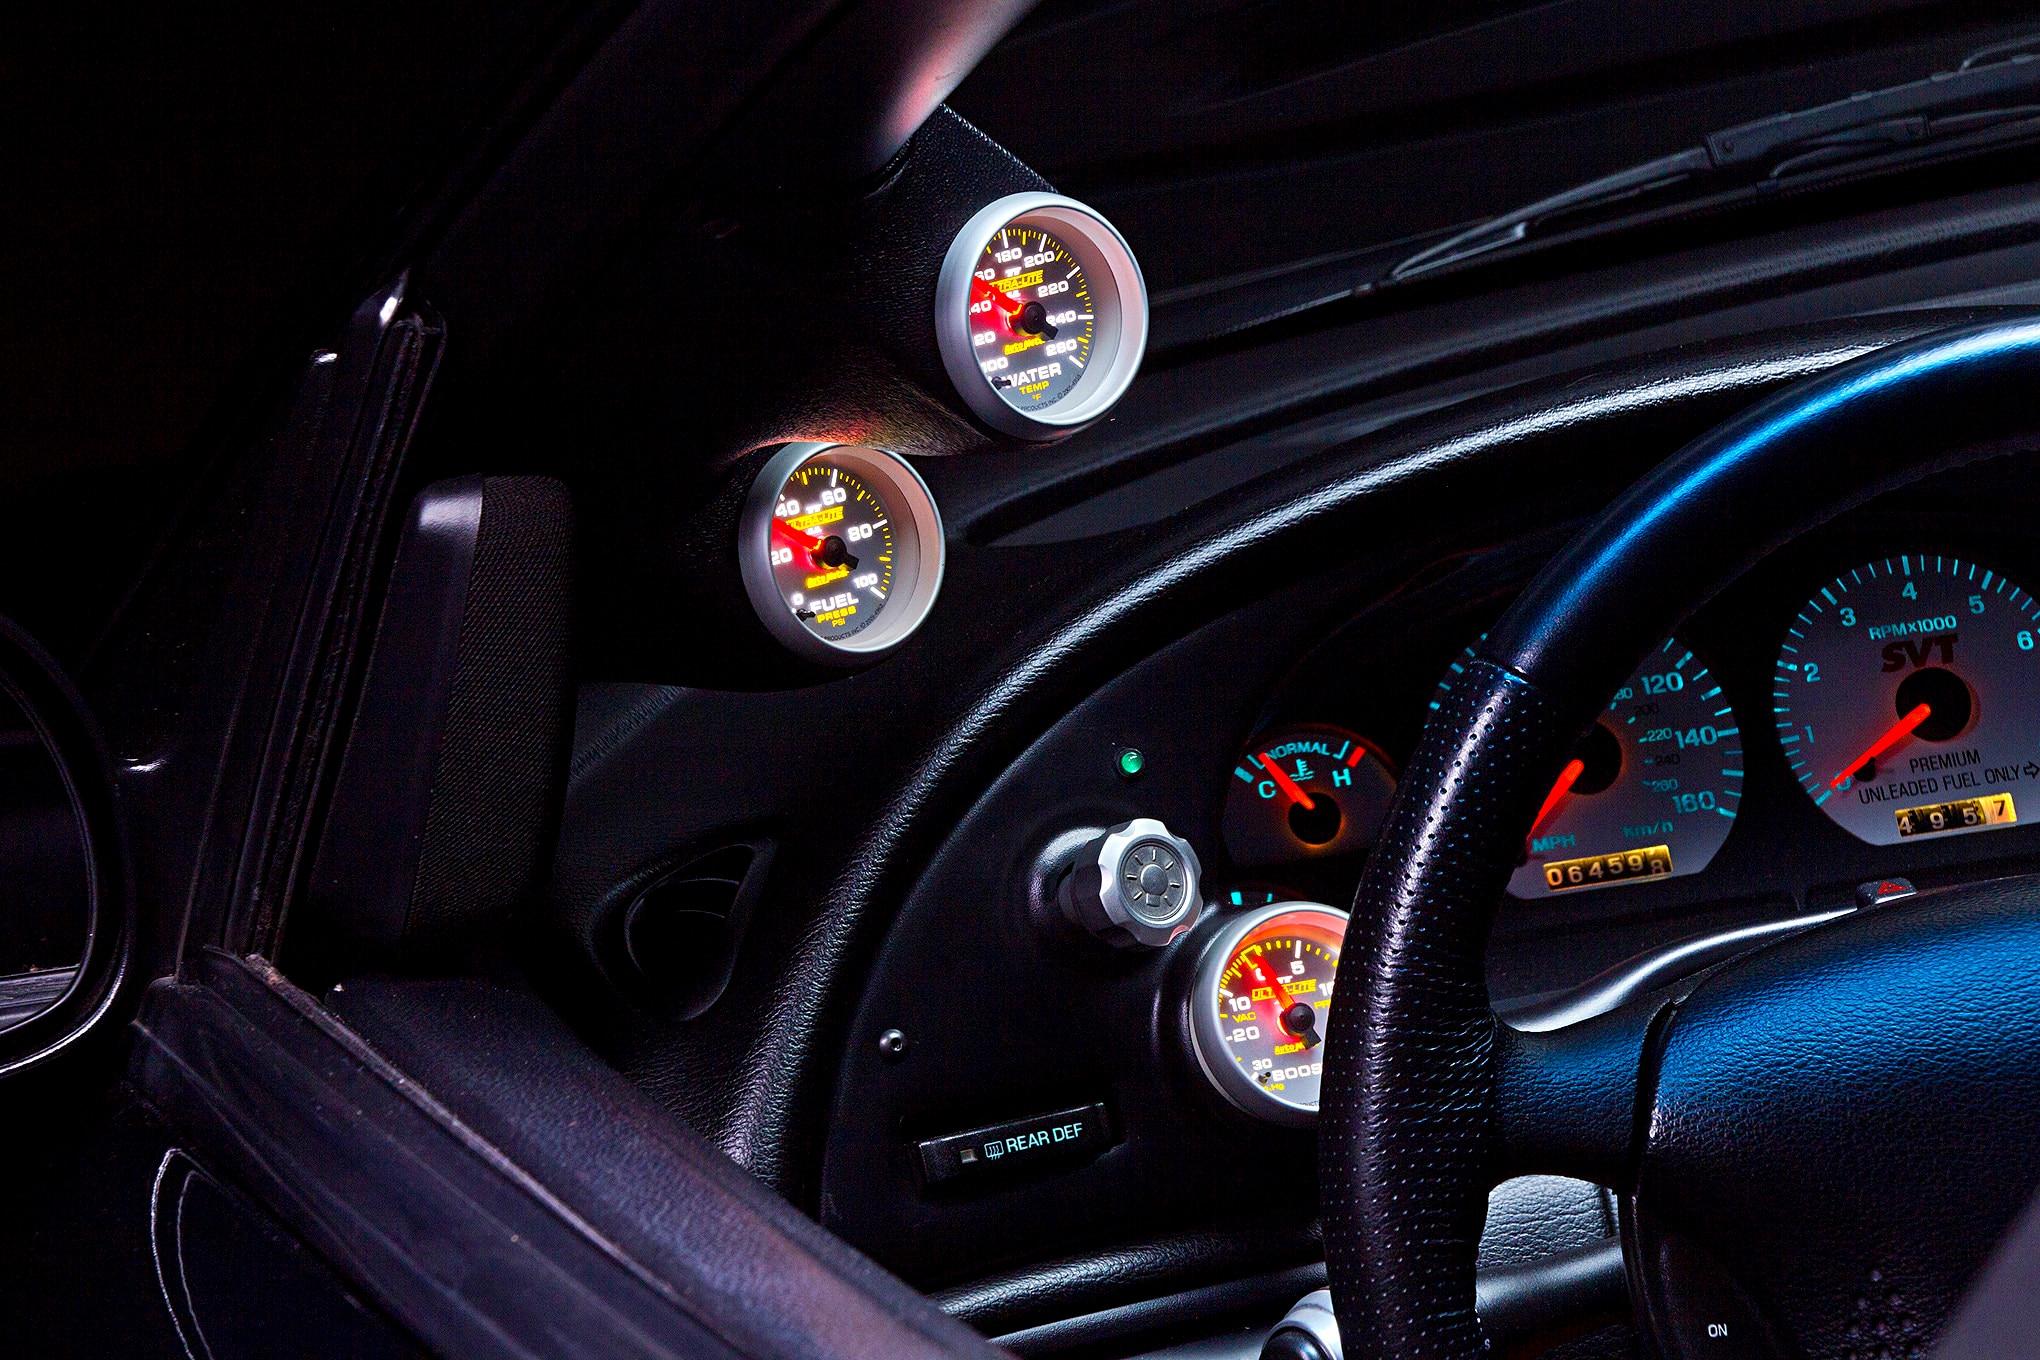 1998 Ford Mustang Cobra 027